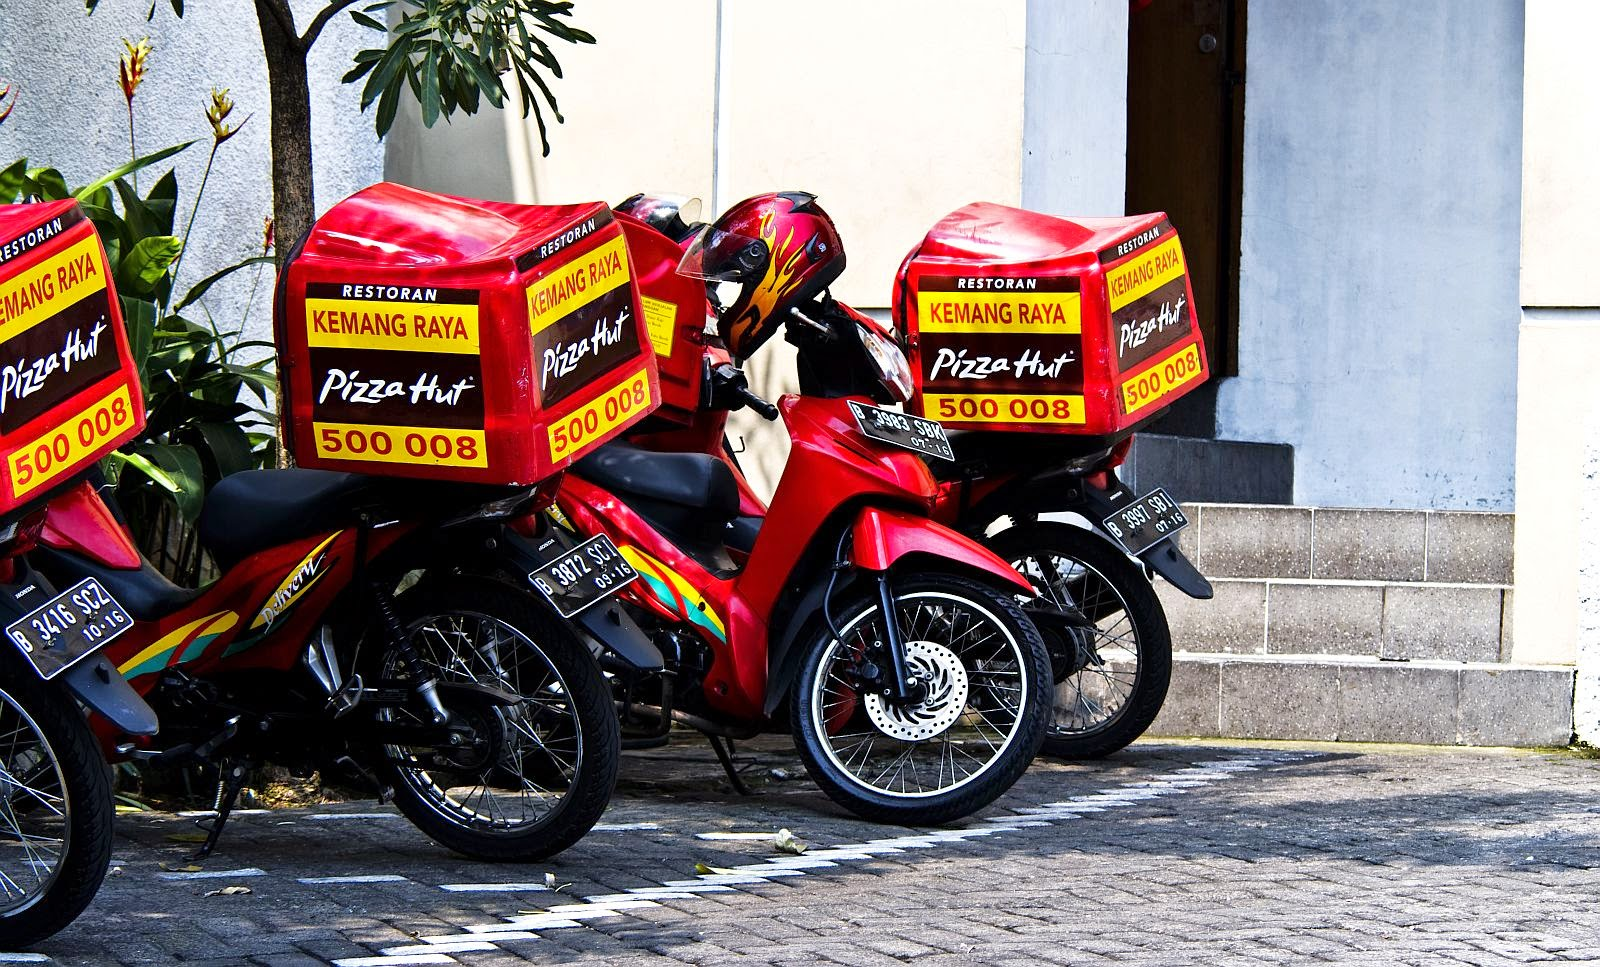 Pizza Hut Delivery Indonesia Phone Number 218 1875238 WENSNENSKRRPWBT